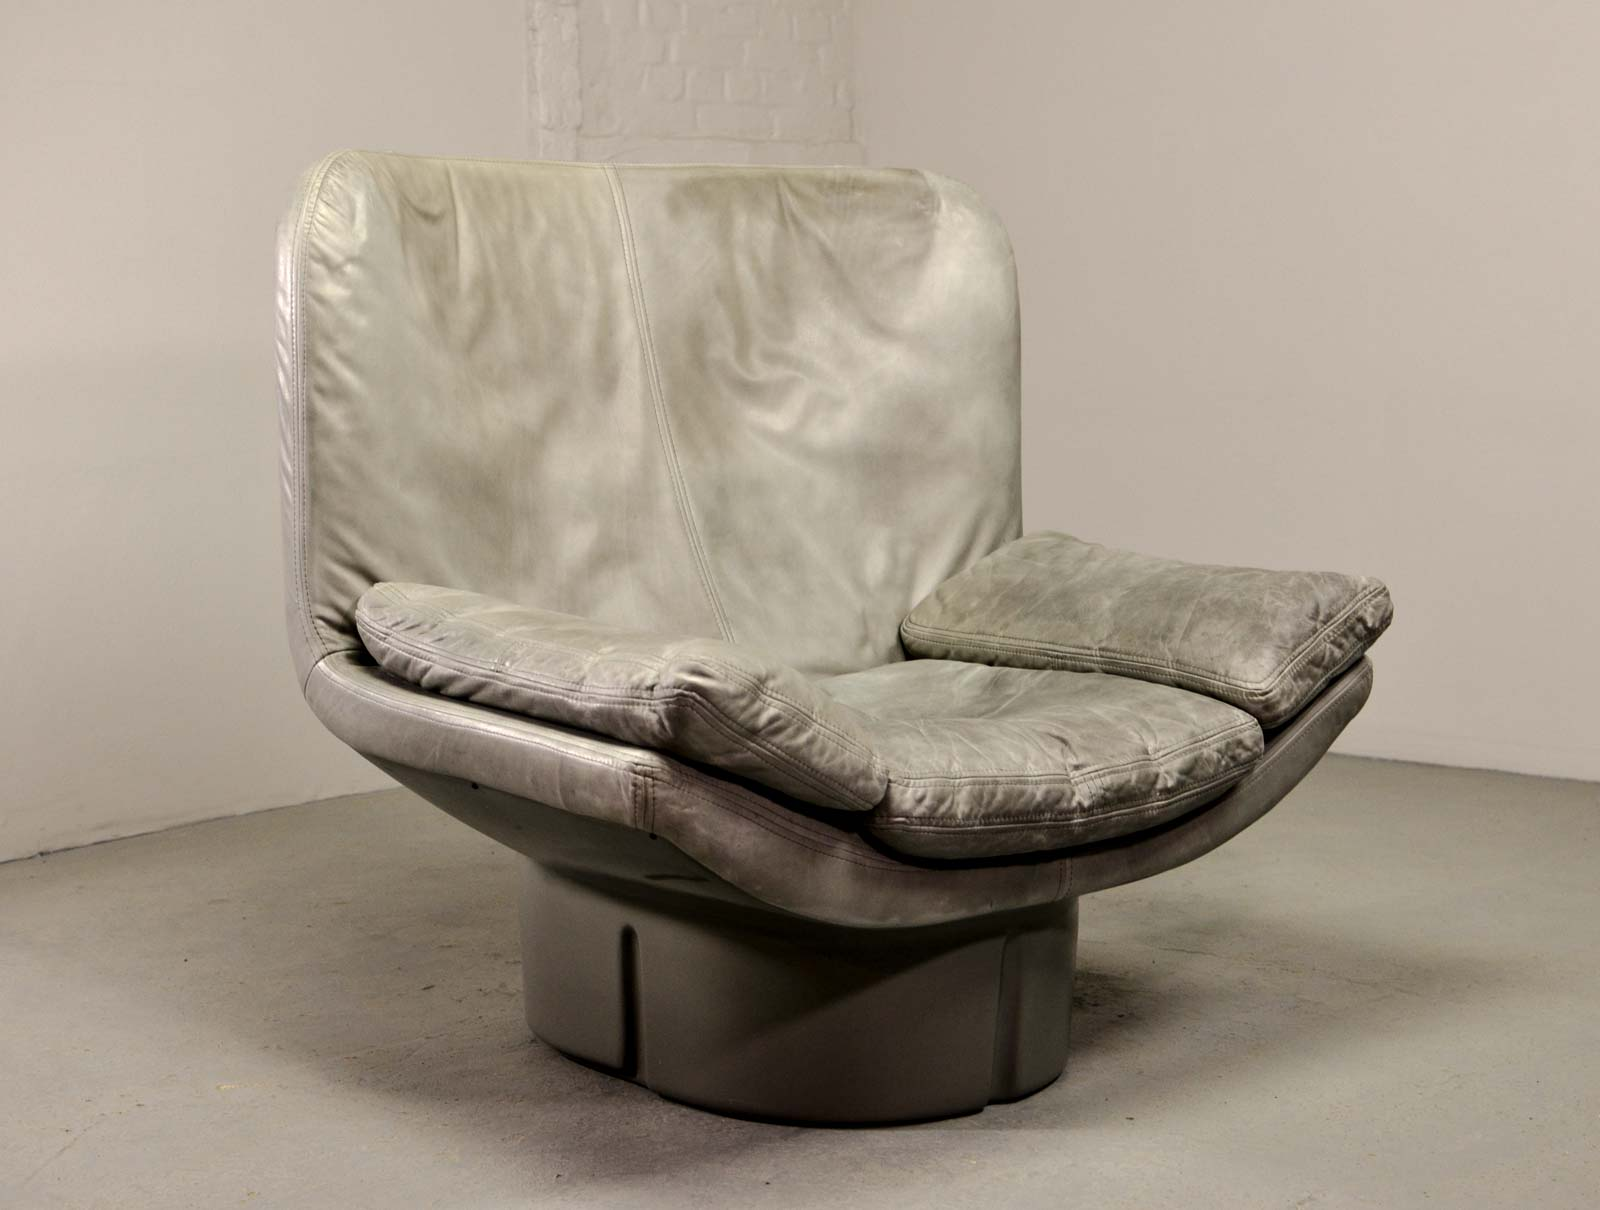 Eye Catching Italian Grey Leather Lounge Chair by Ammanati